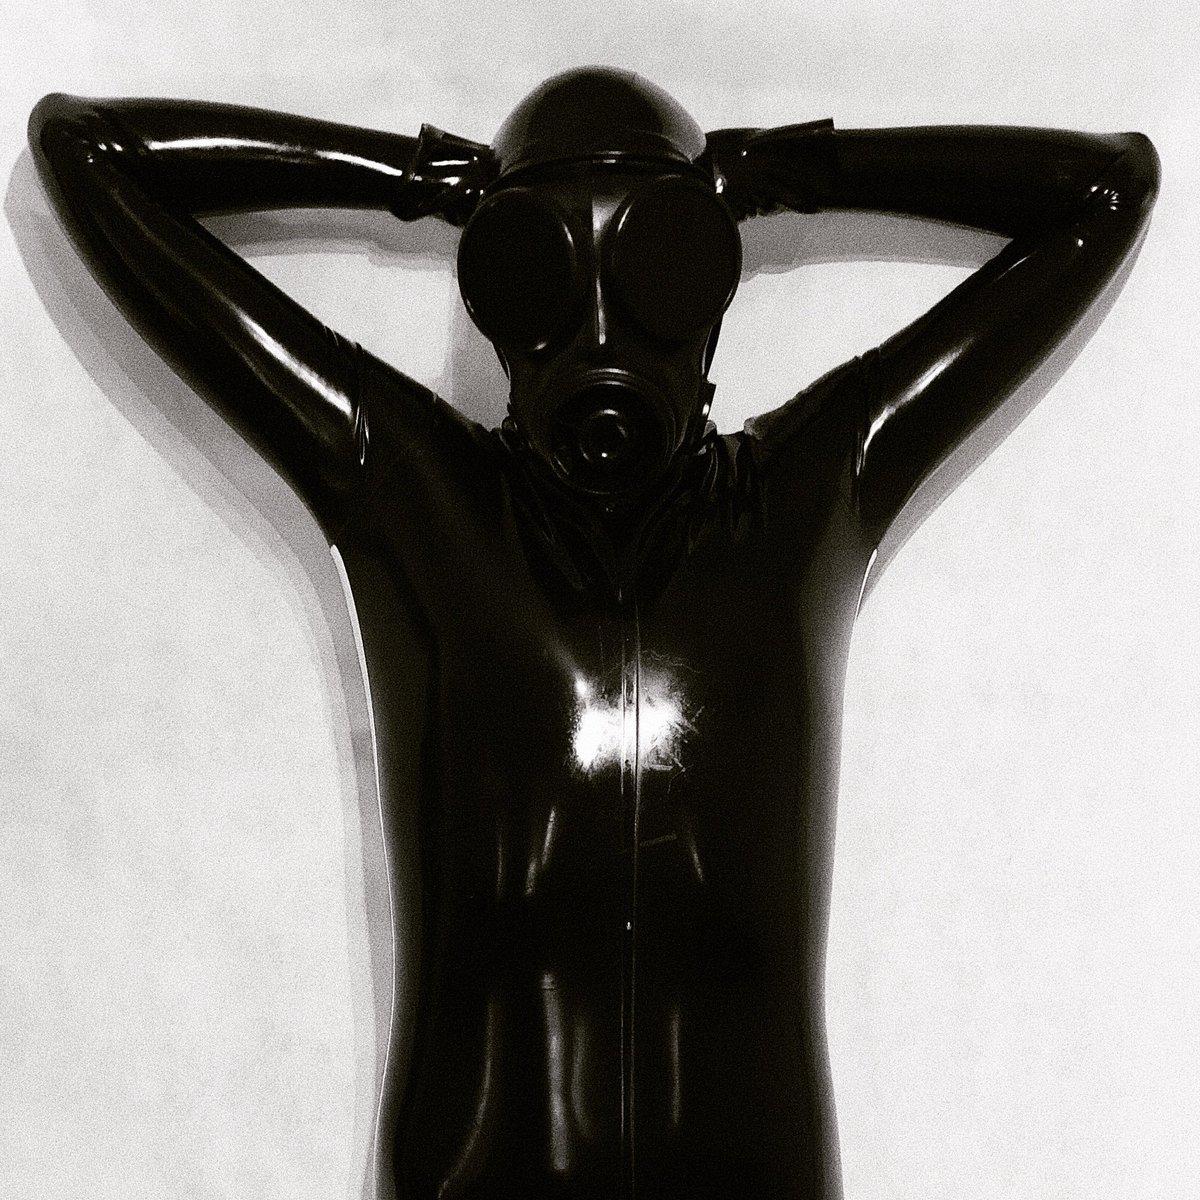 Gimps of the world relax and have a great weekend! 😎 #altmodel #bdsm #bottomboy #gay #gayboy #gaylatex #gayman #gaypride #gayrubber #gearfetish #gimp #guysngear #kink #latex #latexclothing #latexfashion #latexfetish #latexhood #latexlife #latexmask #latexmodel #rubber #rubberboy